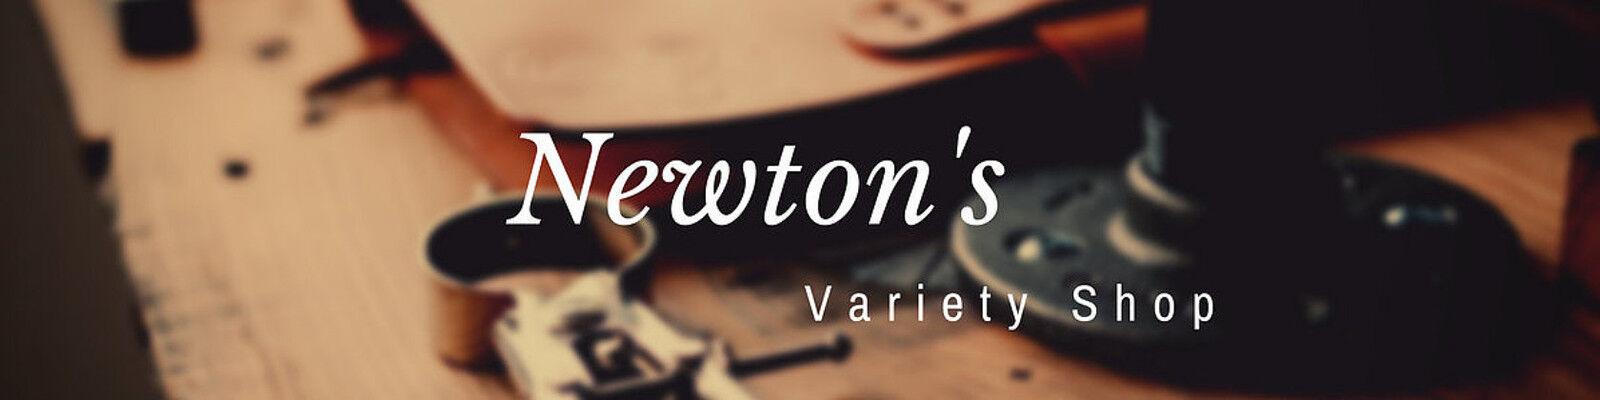 Newton's Variety Shop